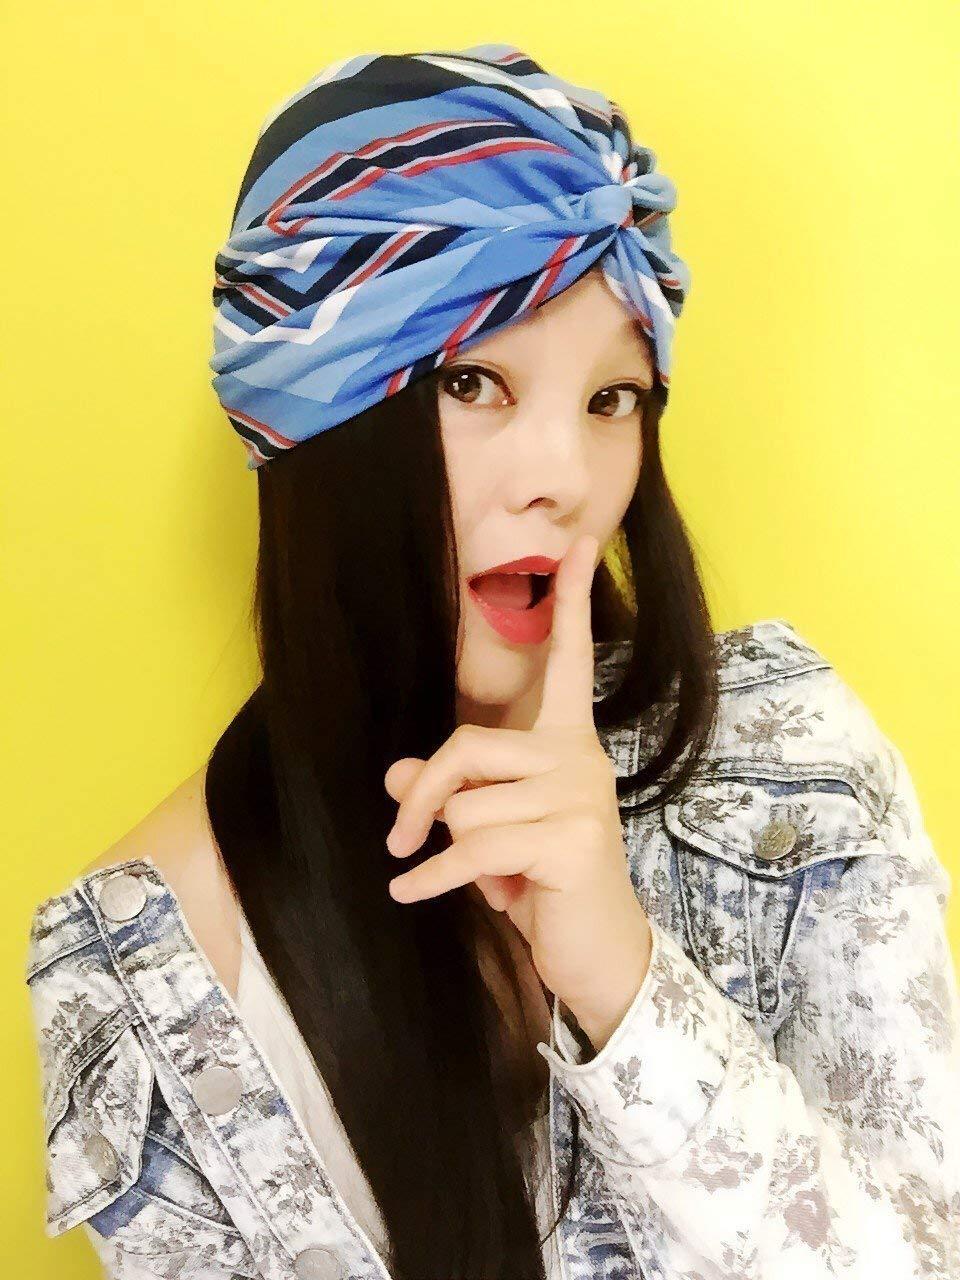 ★★Best Choice And Best Discounts★★Blue lines Turban,Womens Turban,Full Turban,Headband,Turban Hat,Stretch Turban,Fashion Turban,Head Wrap,Scarf,Headbands,Hipster,Fashion,Gift,Show,Party,Holiday